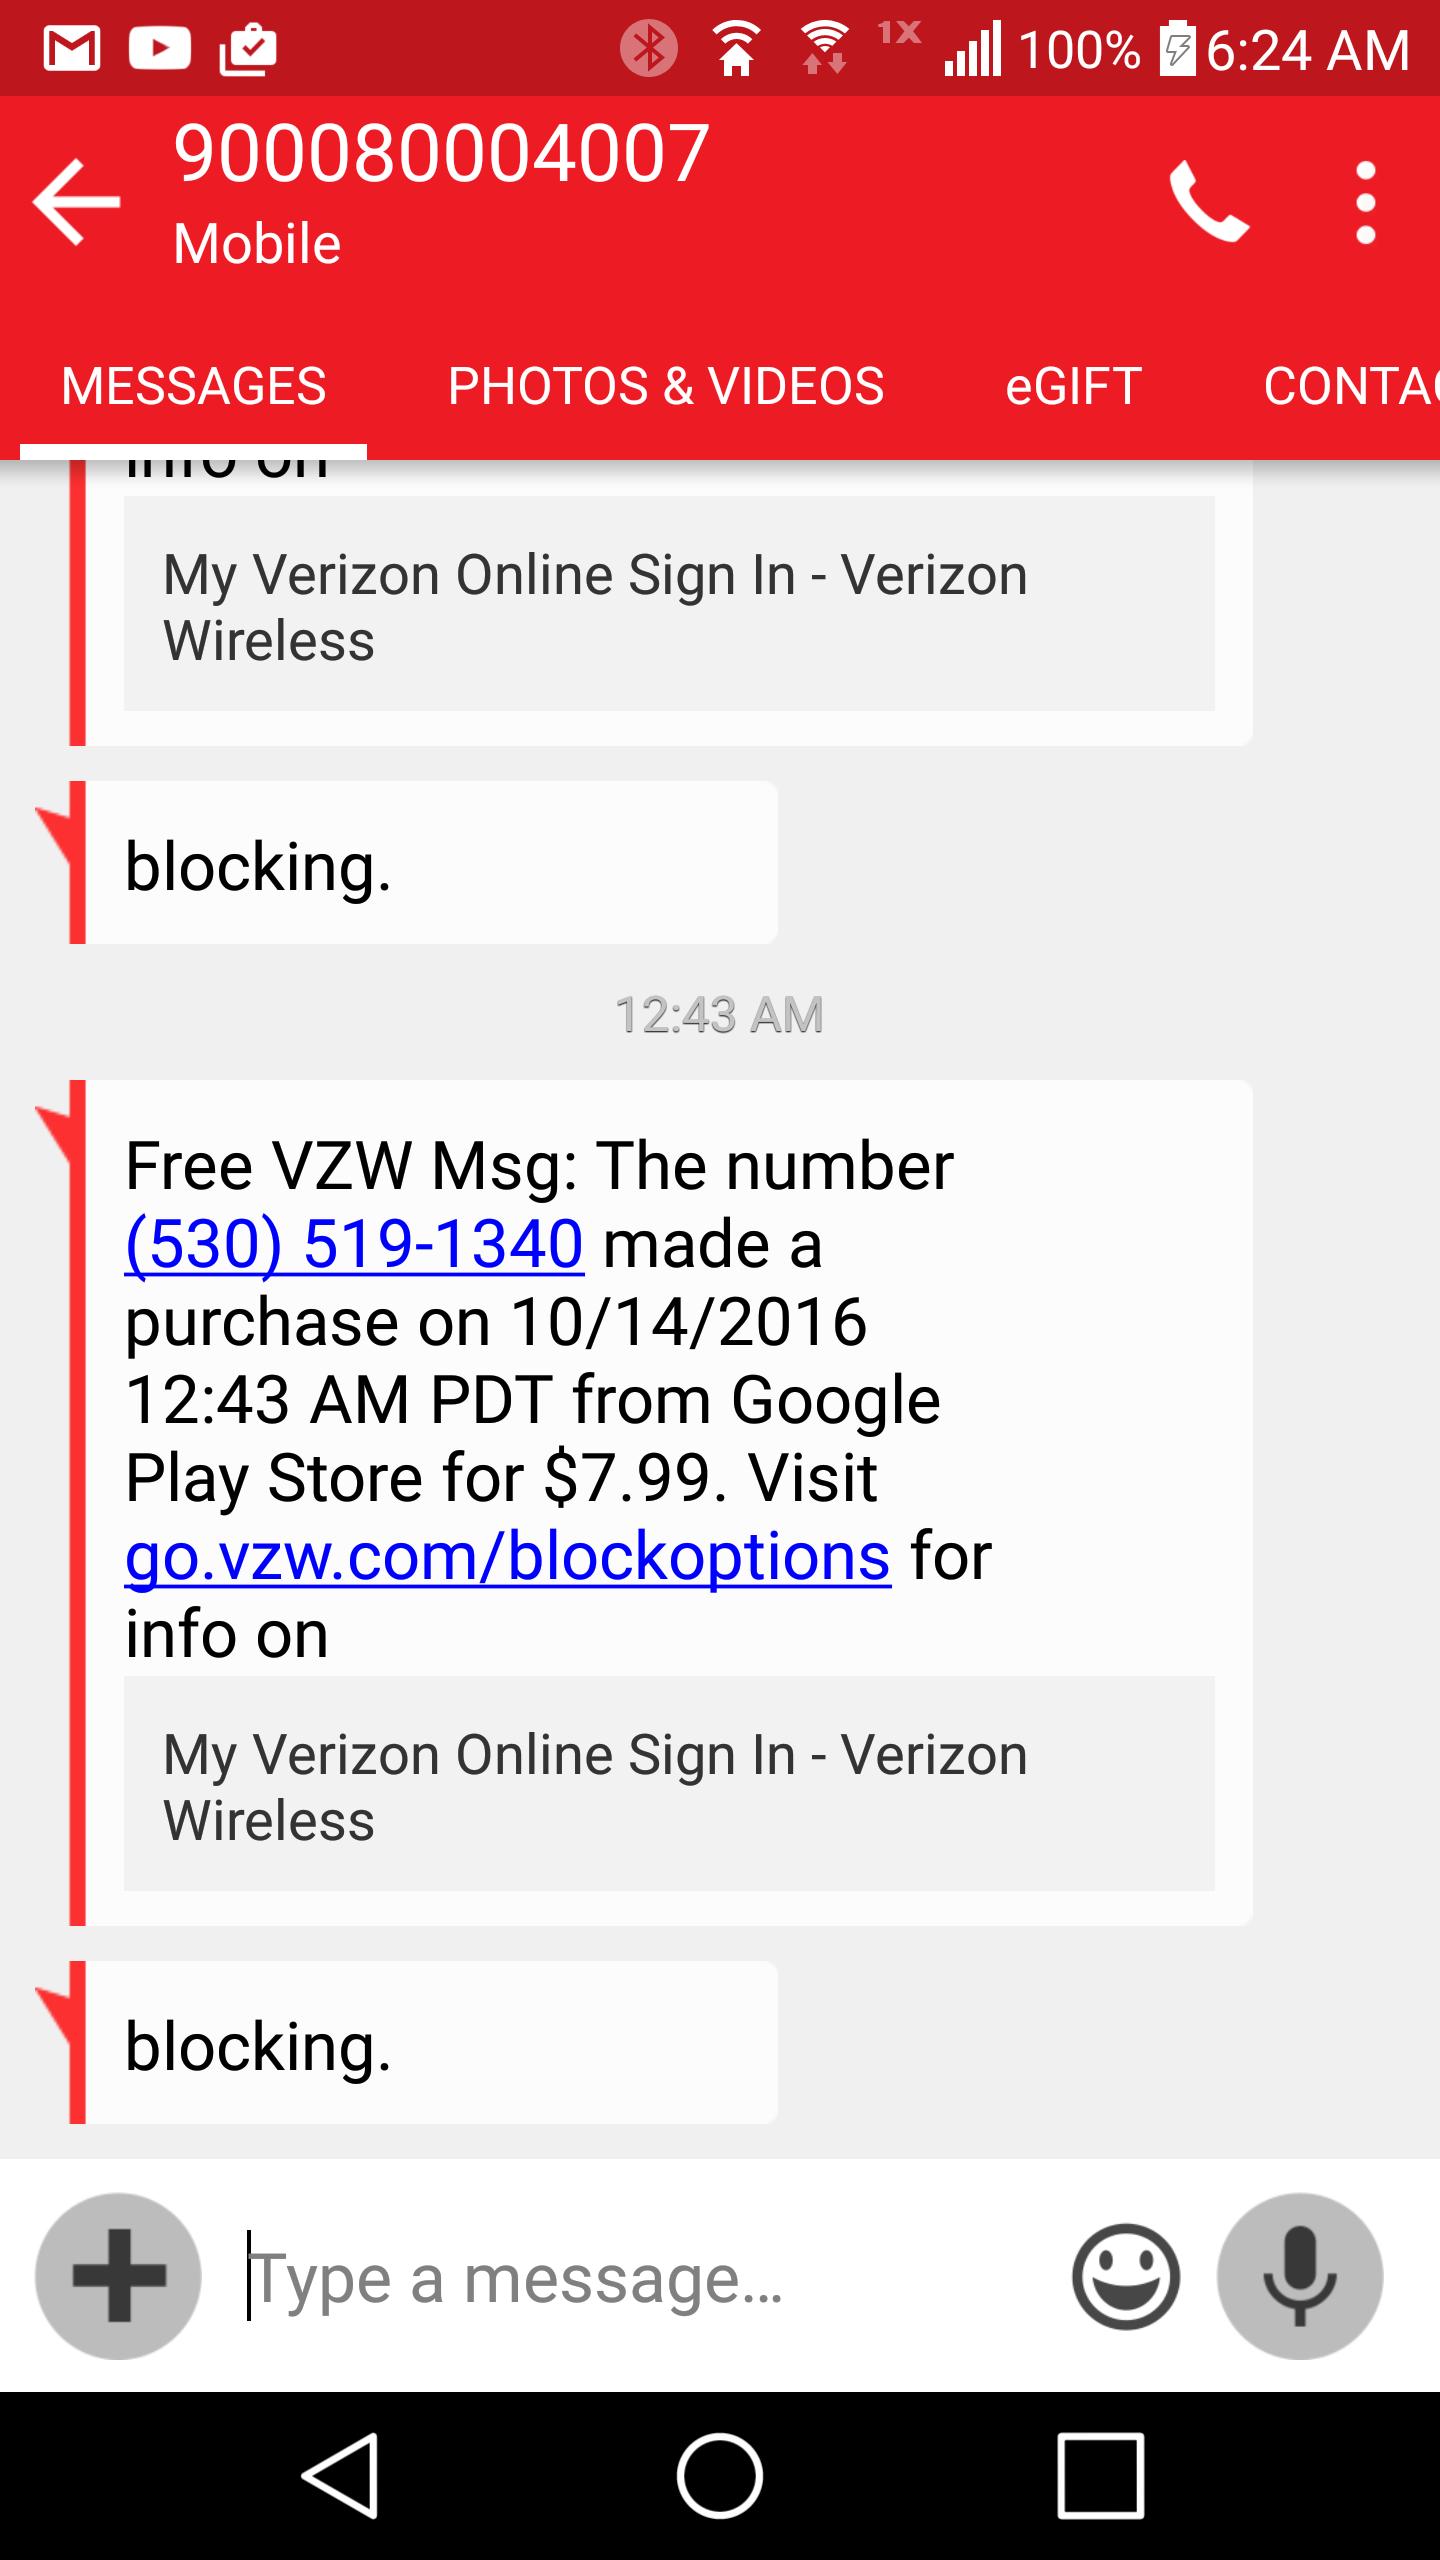 Verizon Customer Service Complaints Department